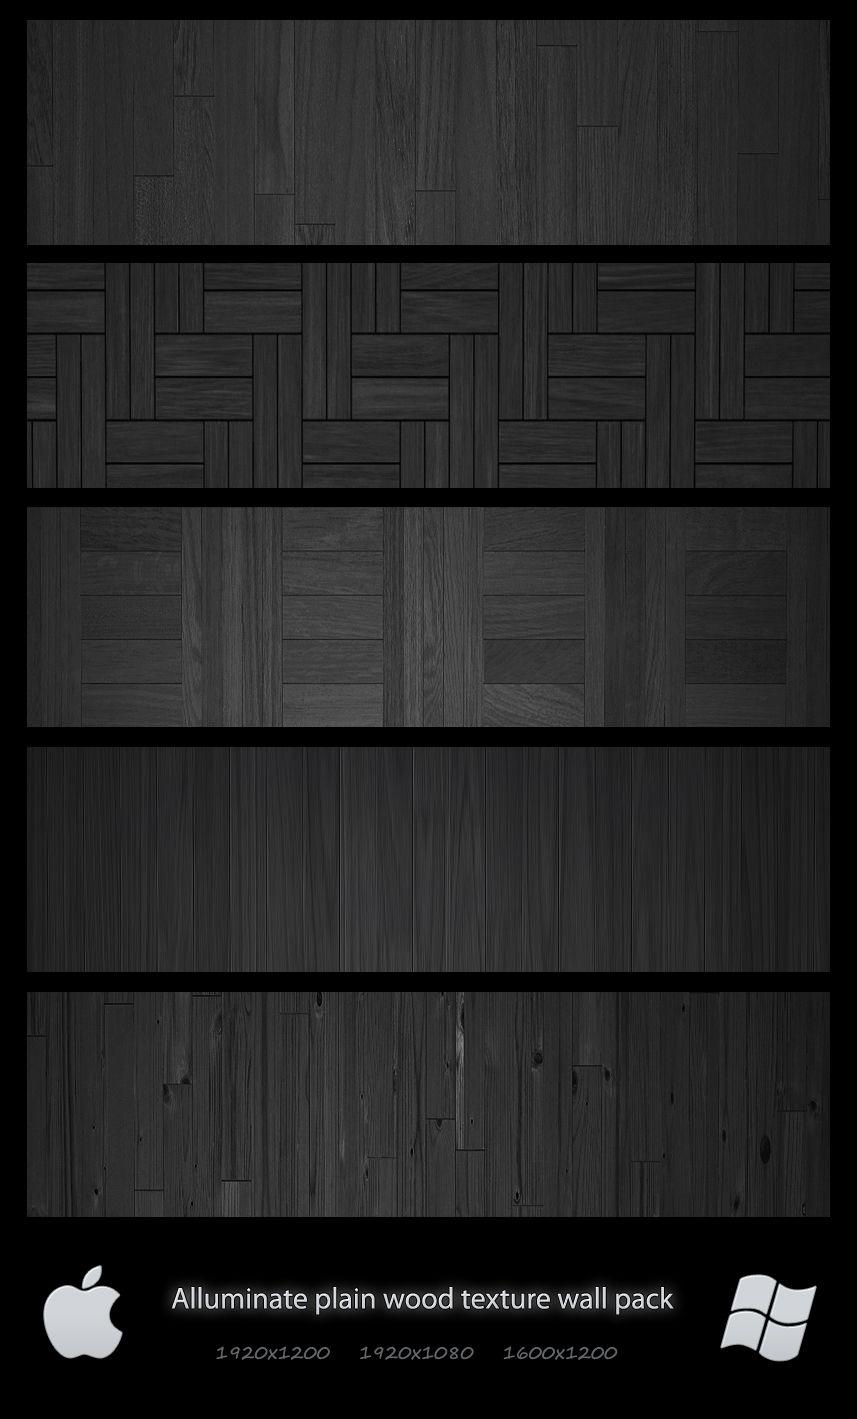 Alluminate Wood Pack By Vstyler Deviantart Com On Deviantart Black Hardwood Floors Wood Wood Floors